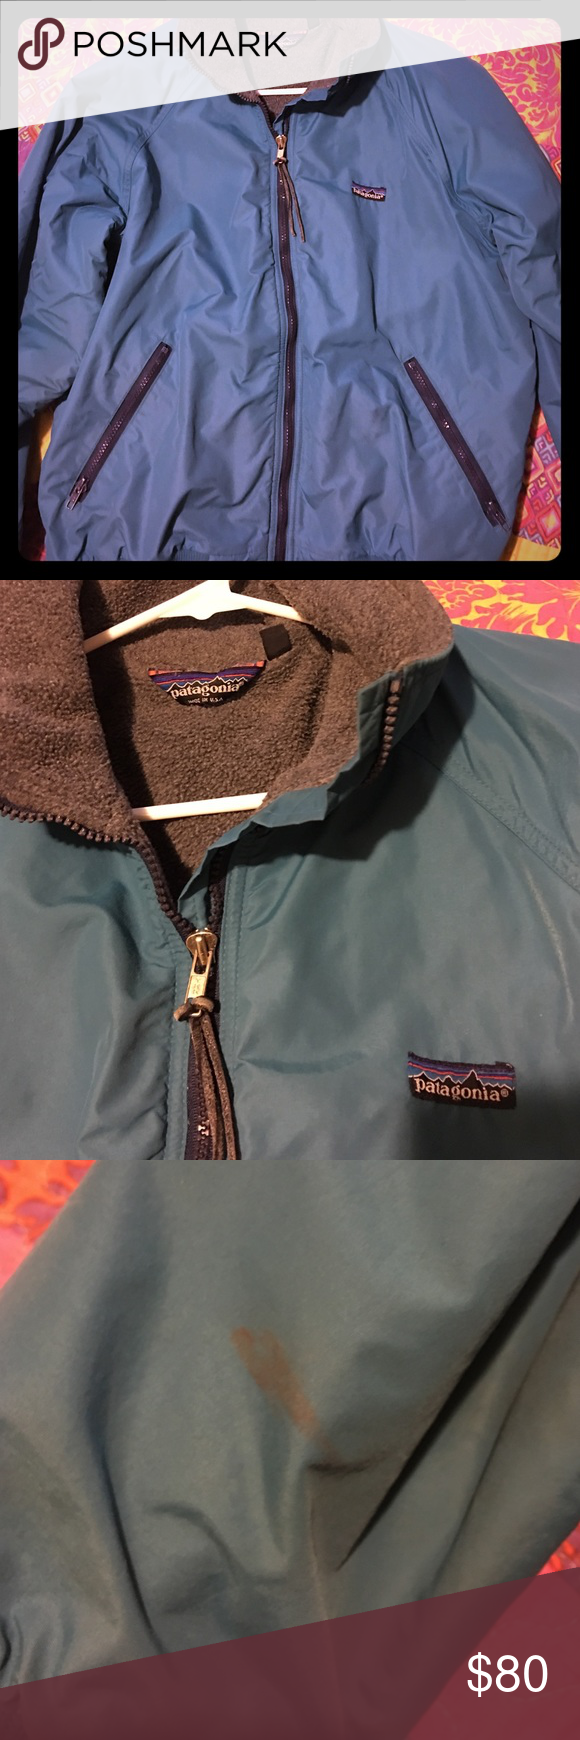 Patagonia fleece jacket coats teal and patagonia jacket